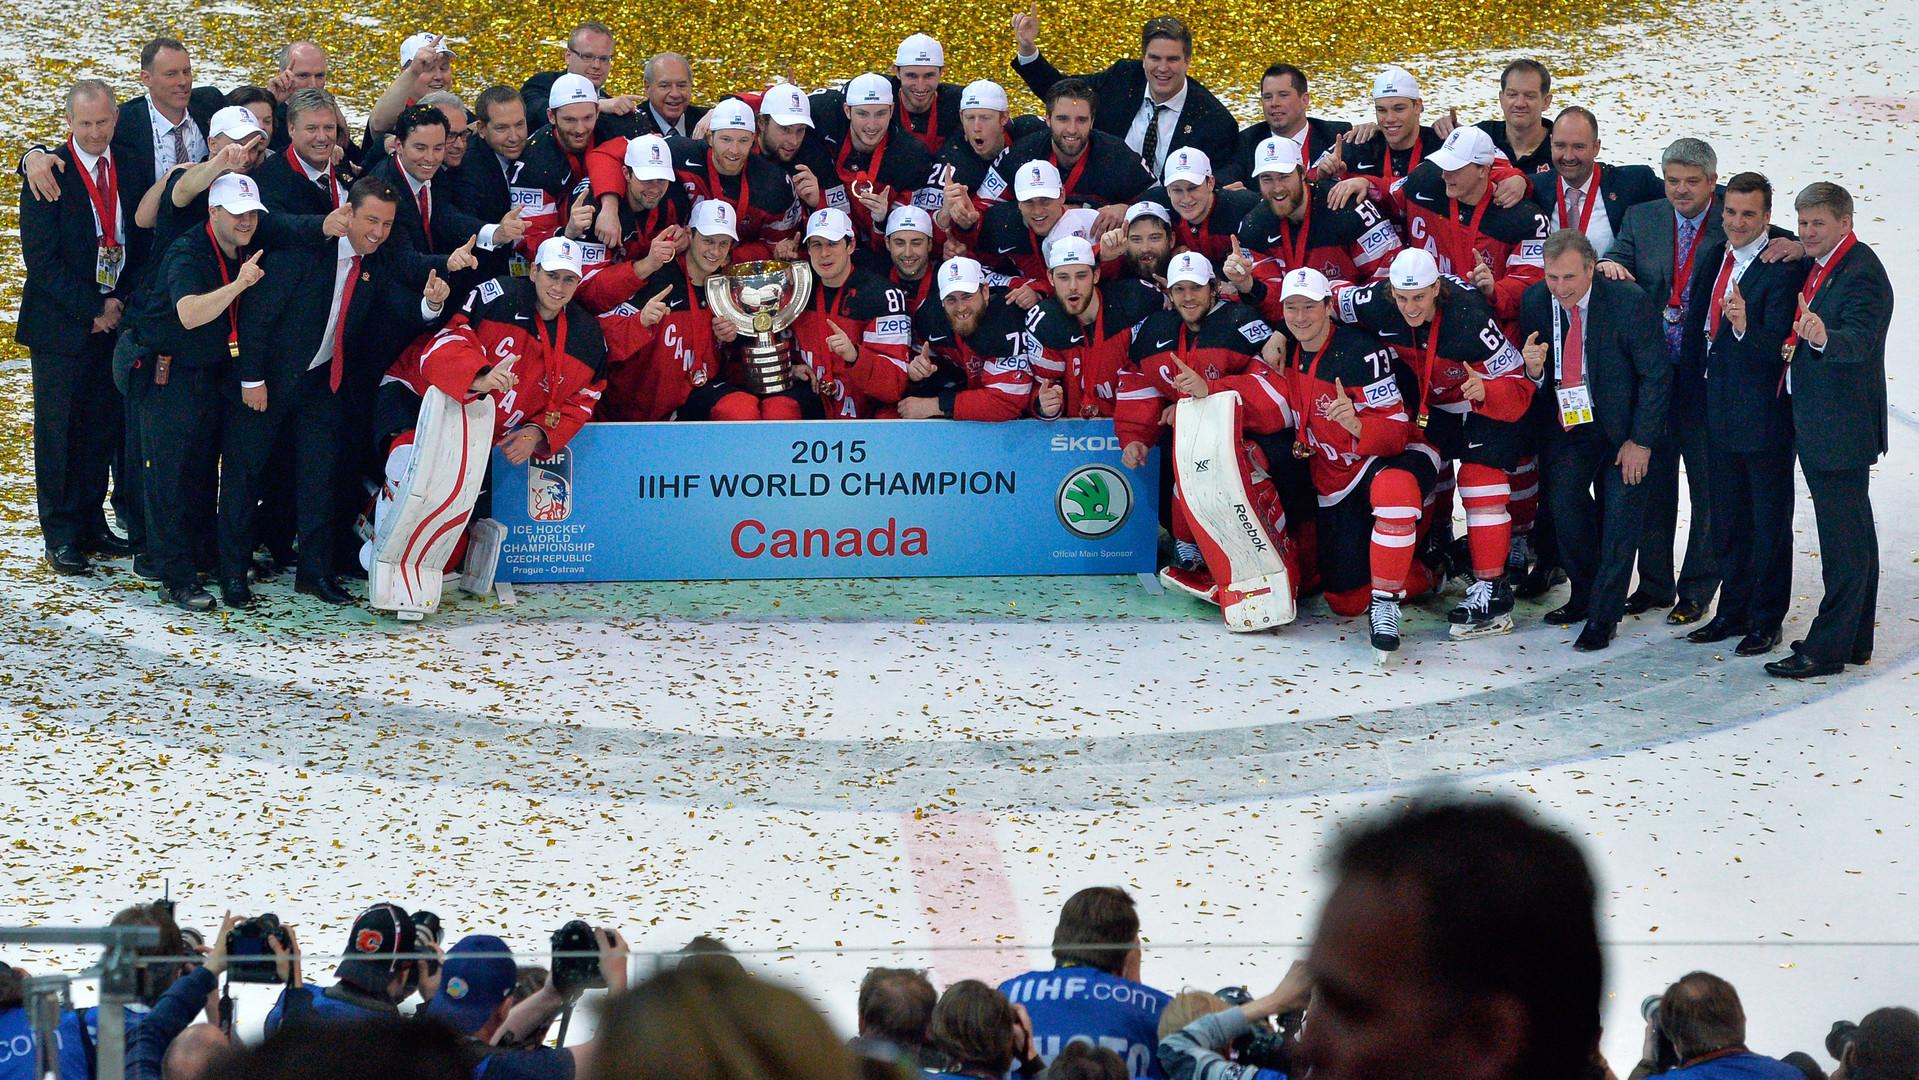 L'équipe canadienne célèbre sa victoire